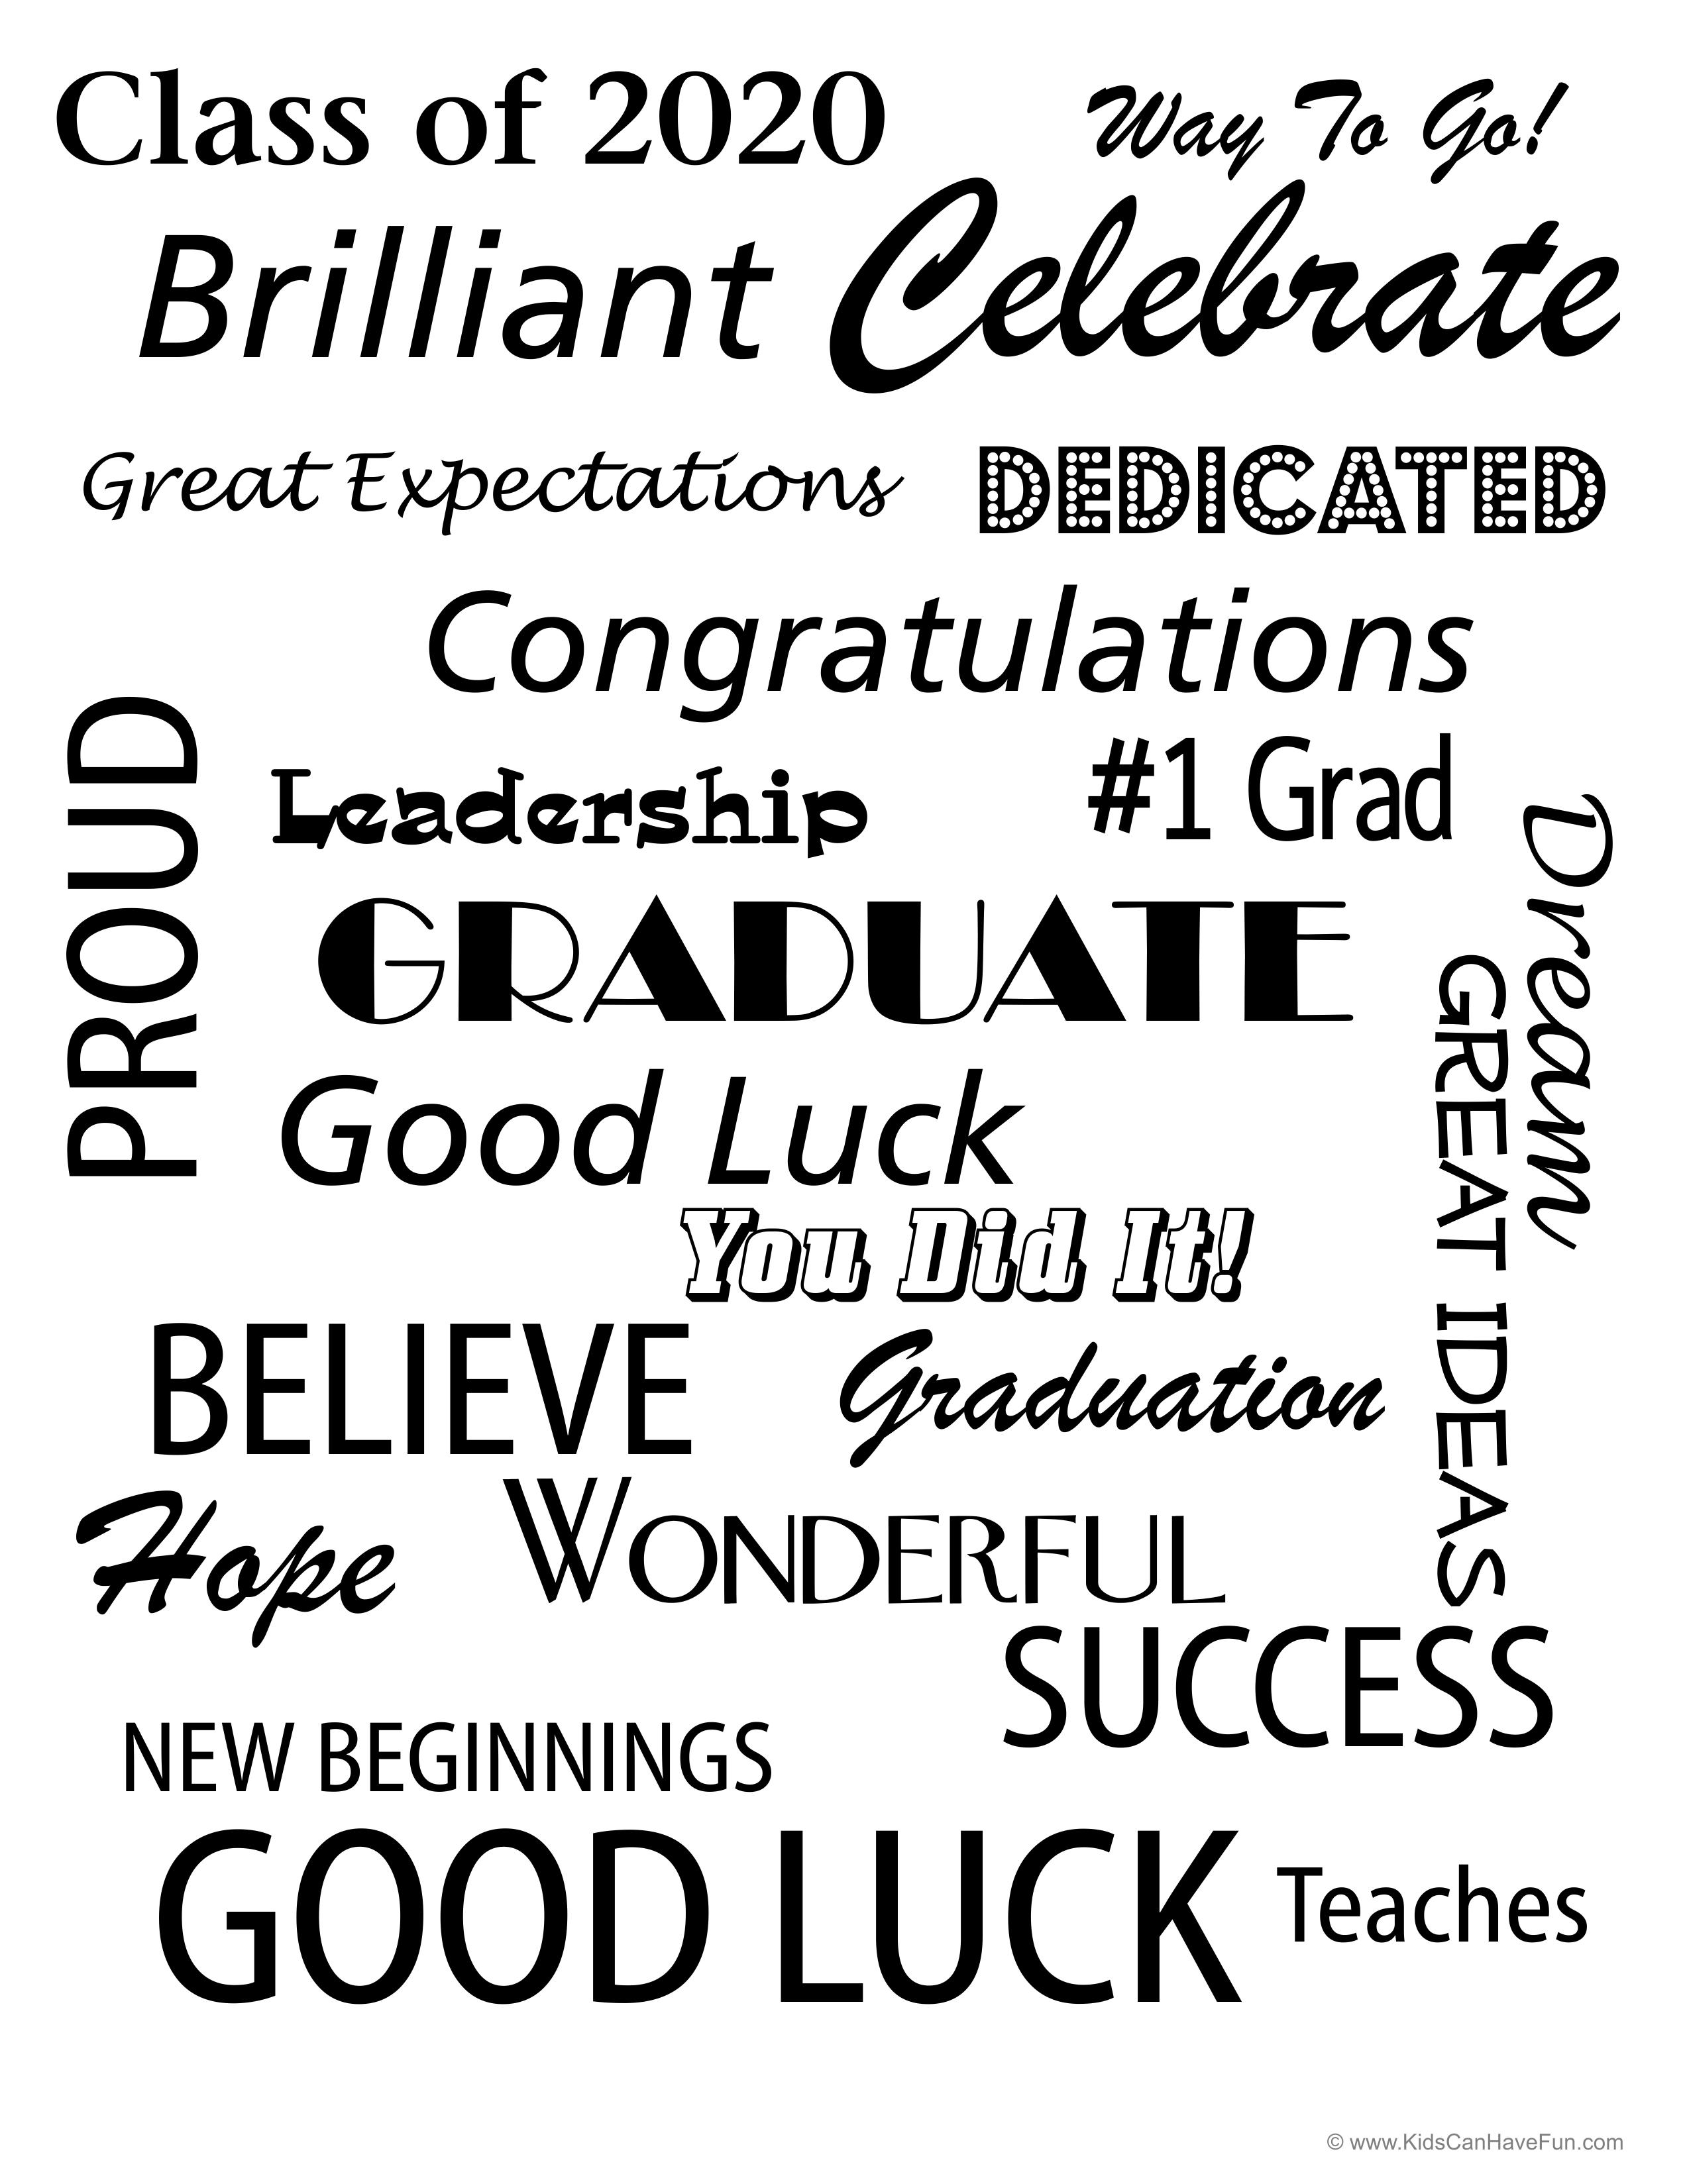 Pin on Last Day of School, Graduation, Thank You Teacher